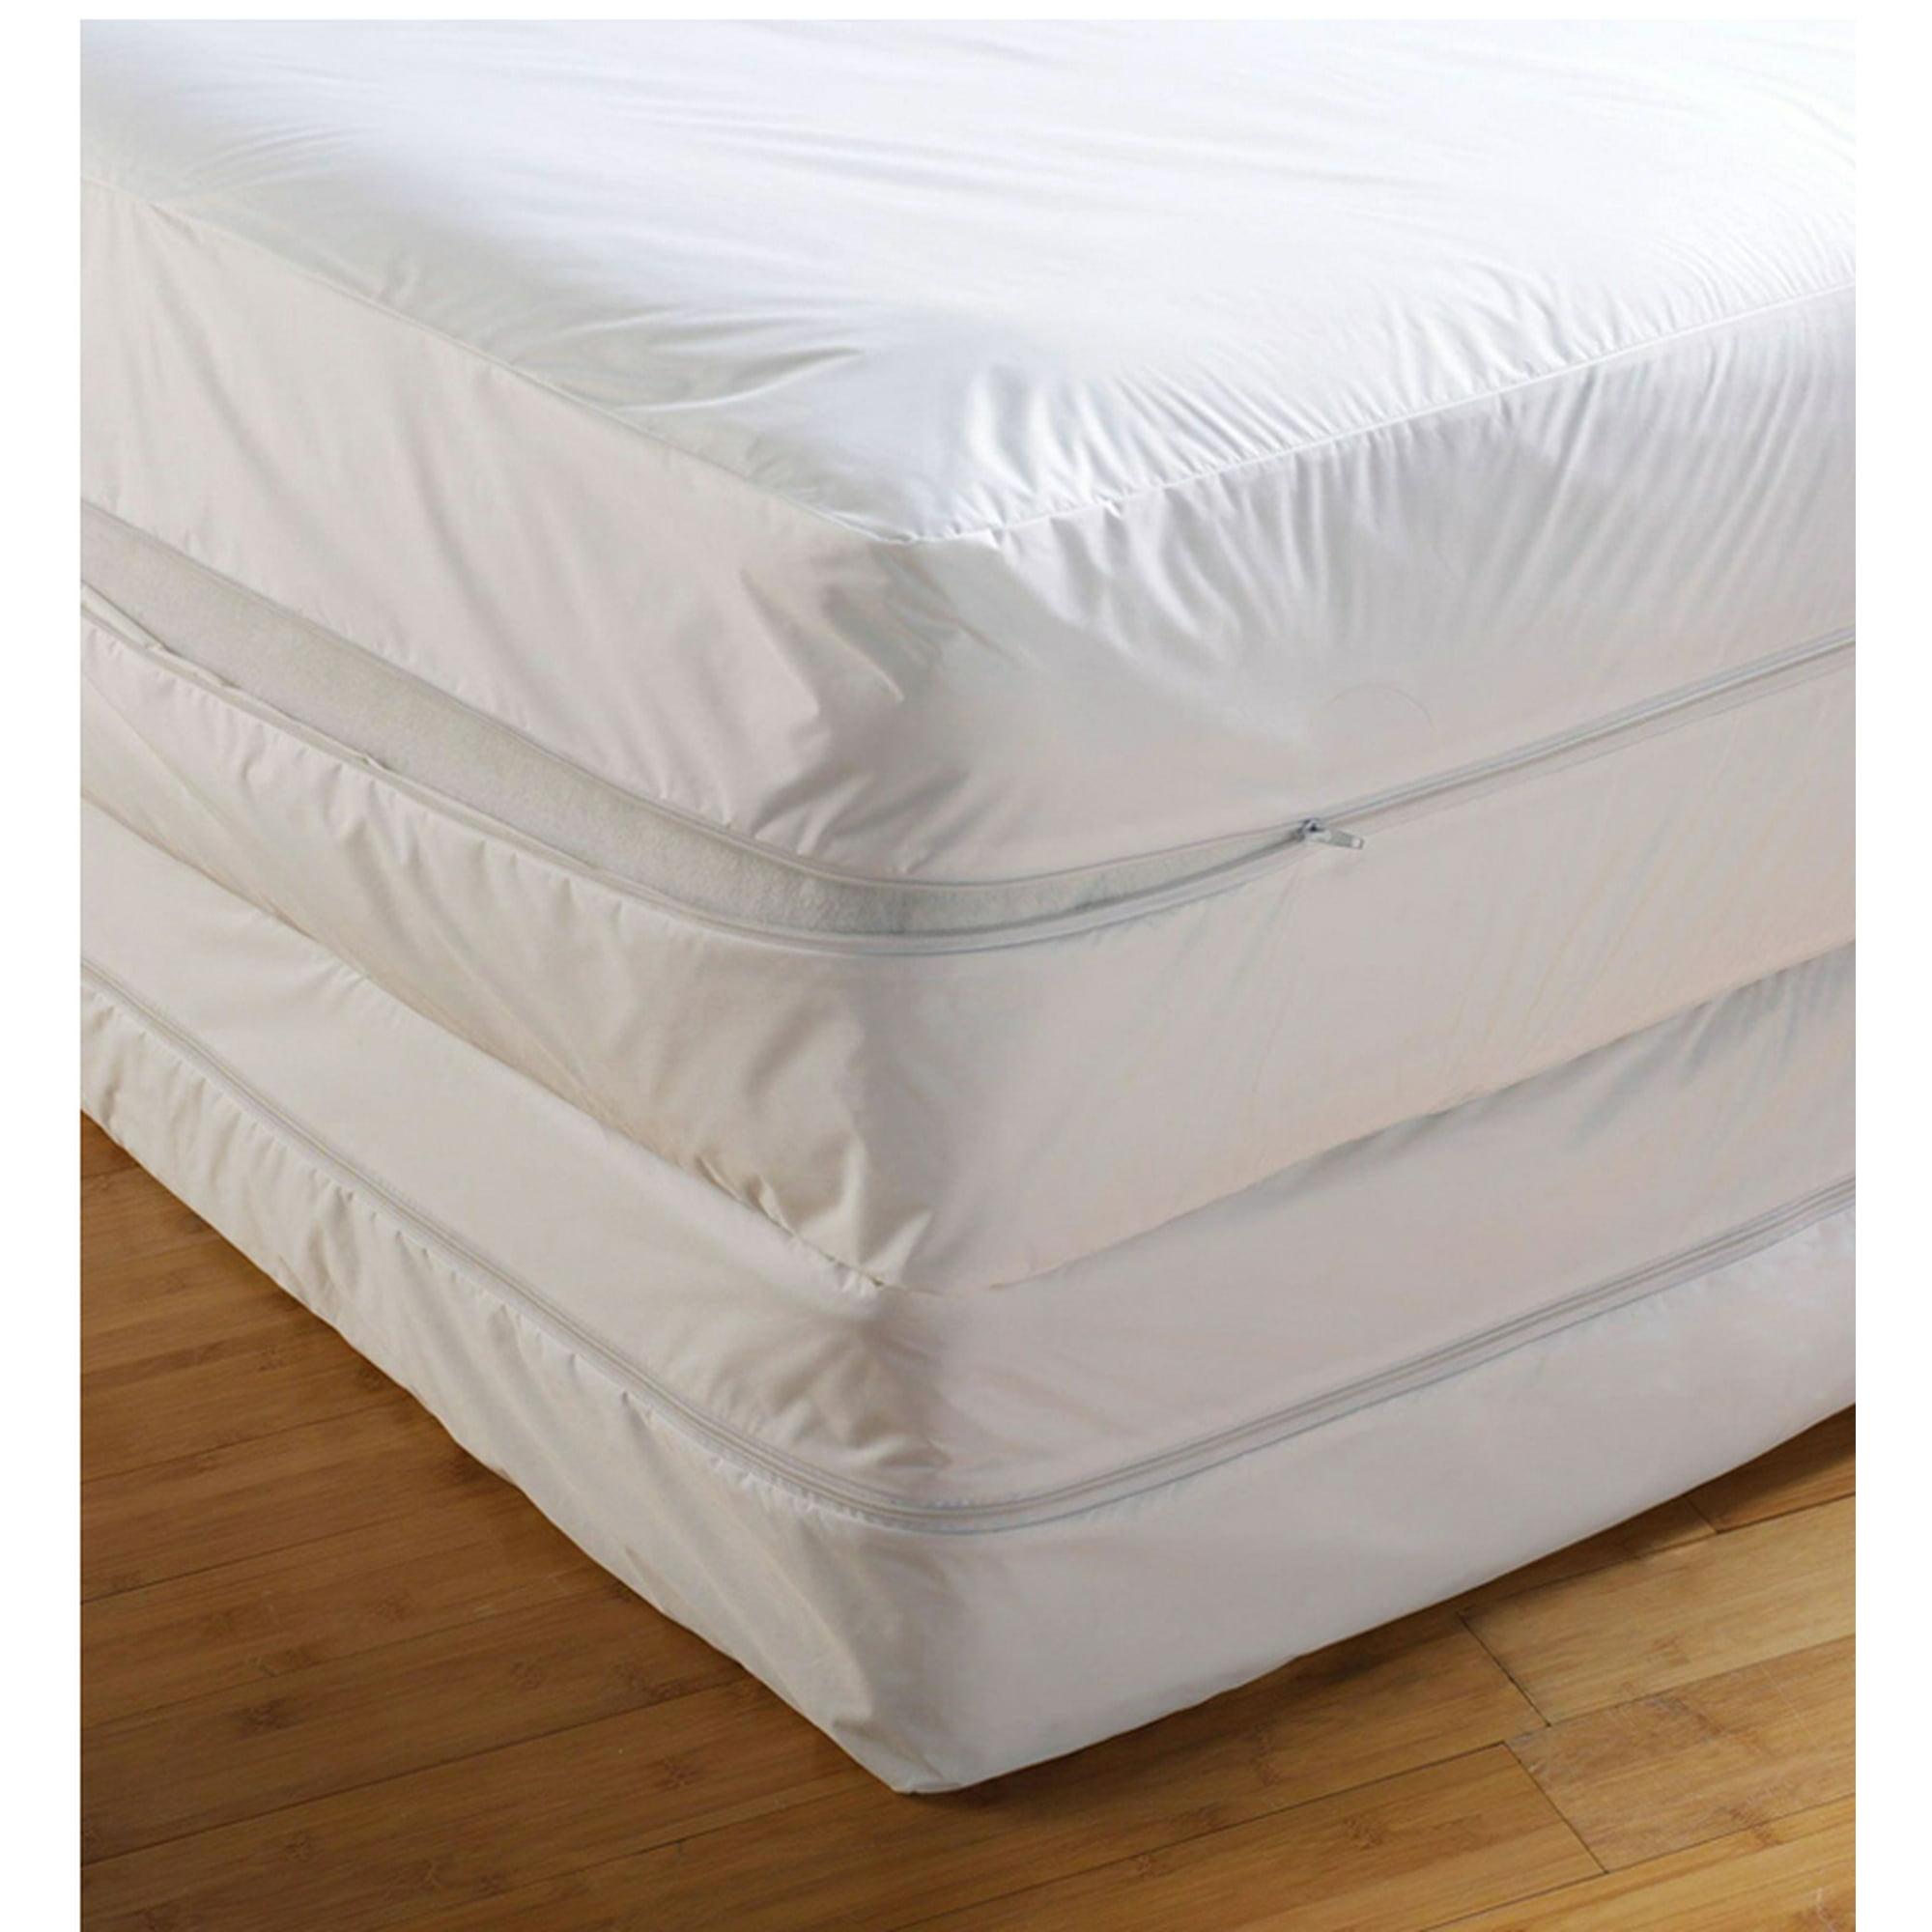 Anti Bed Bug Mattress Protector Box Spring Protector 12 Inch Walmart Canada